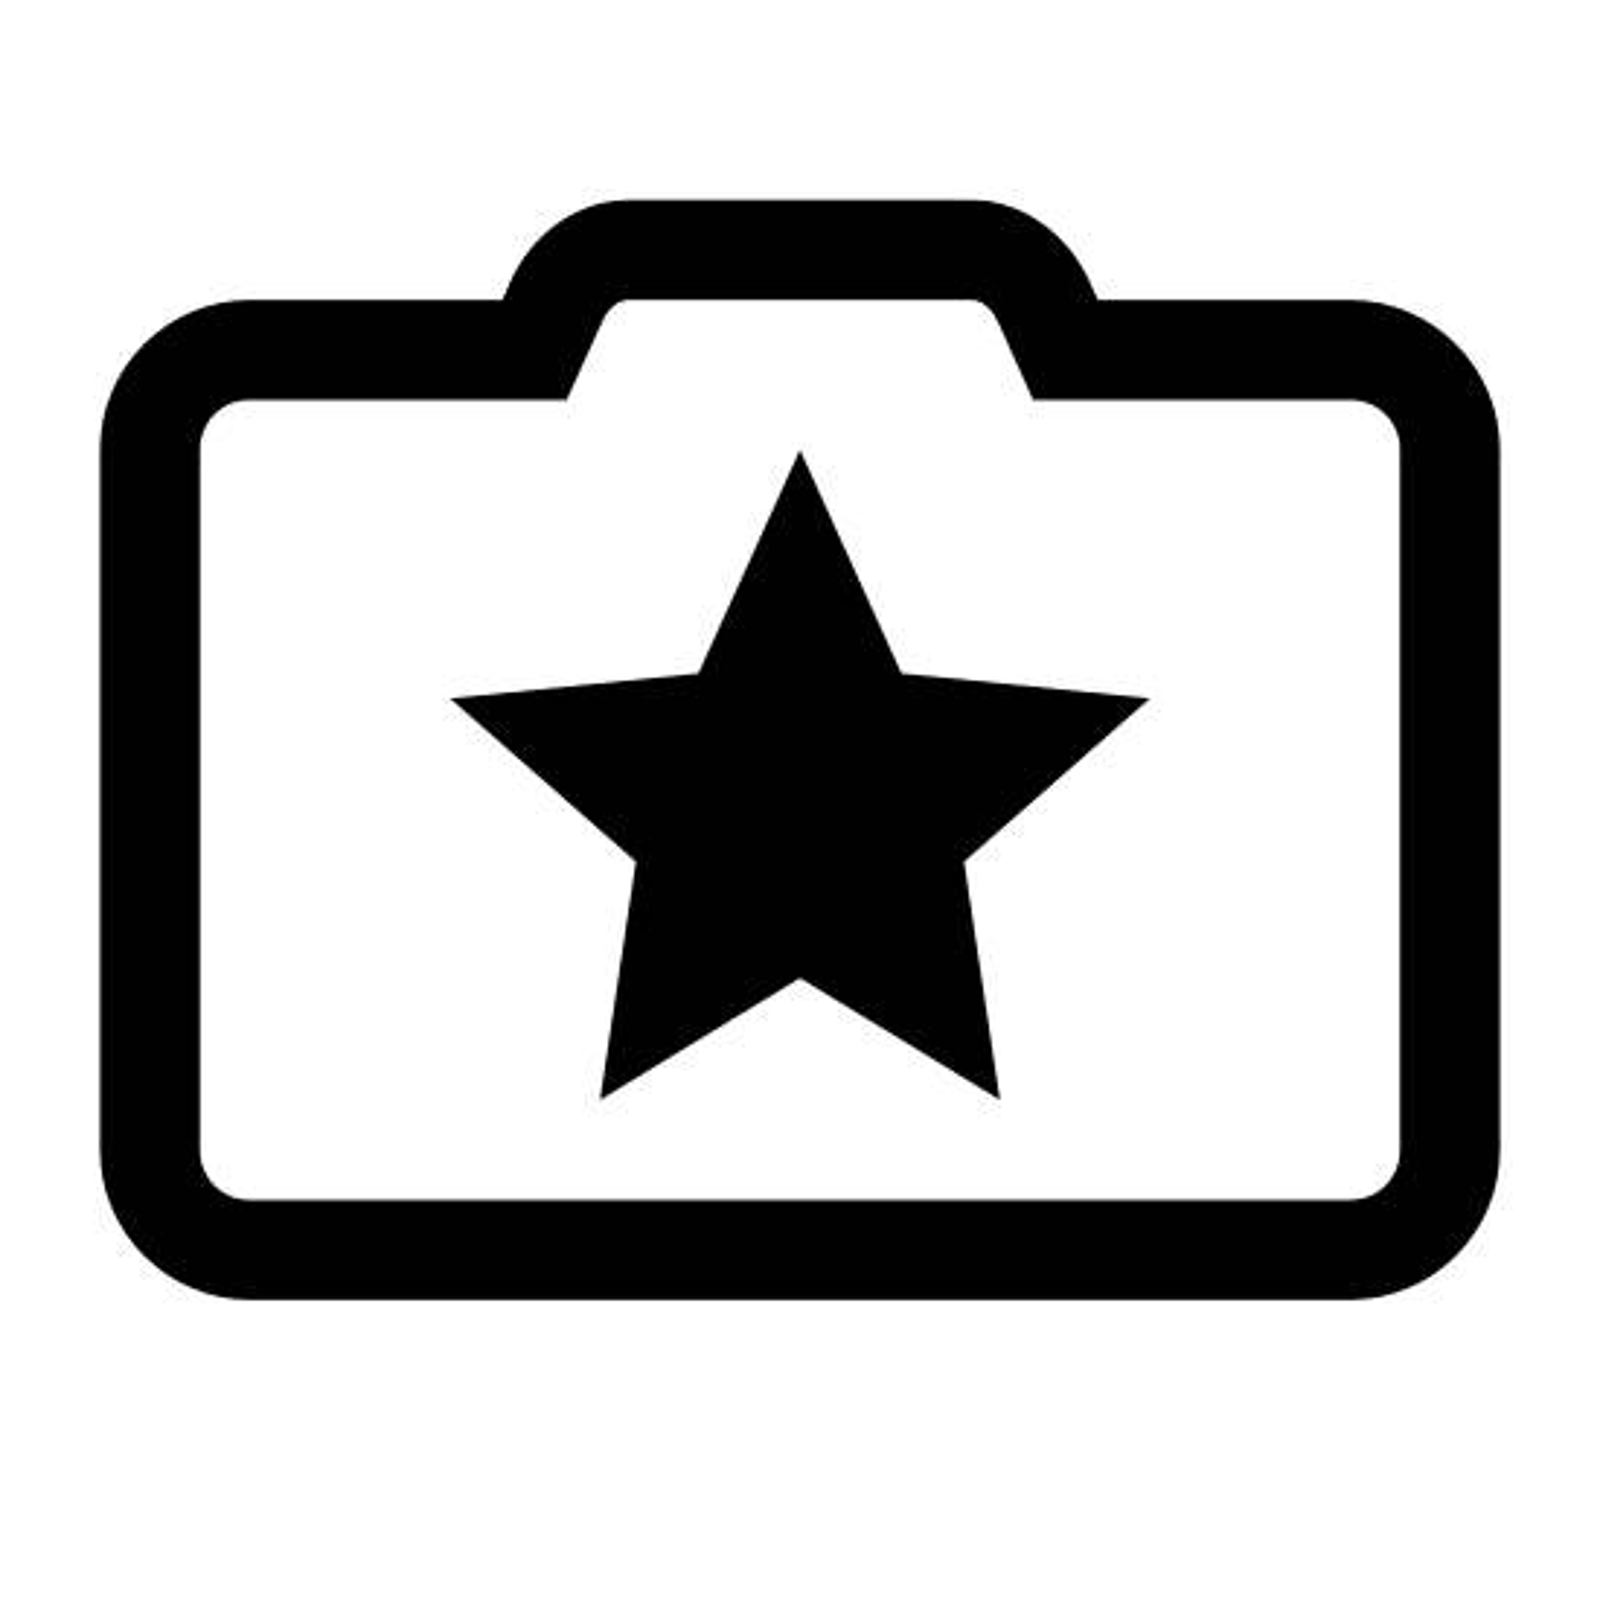 Aparat Enhance icon